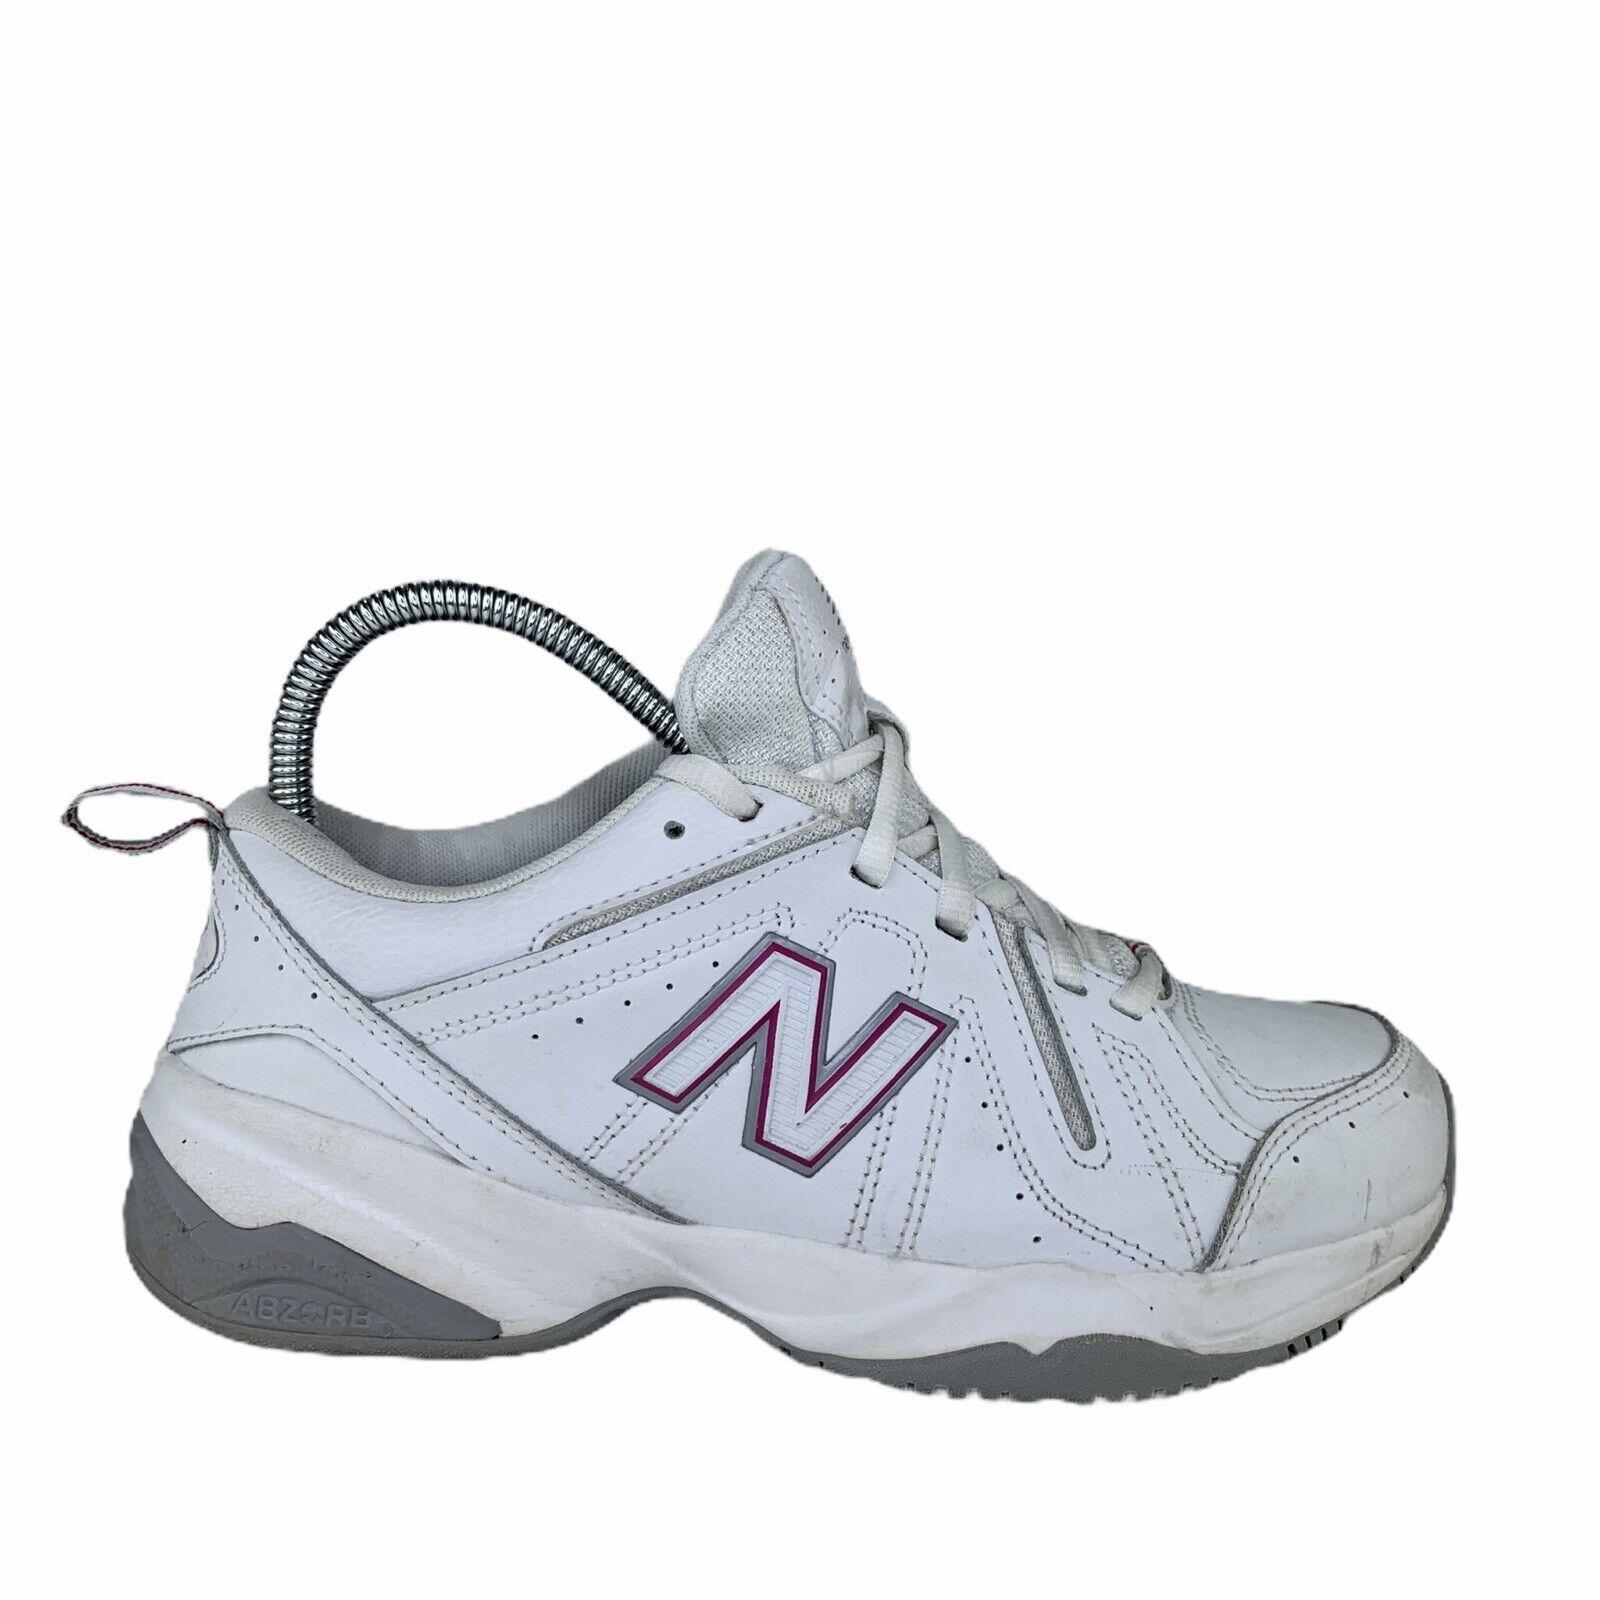 new balance women's cross training sneakers